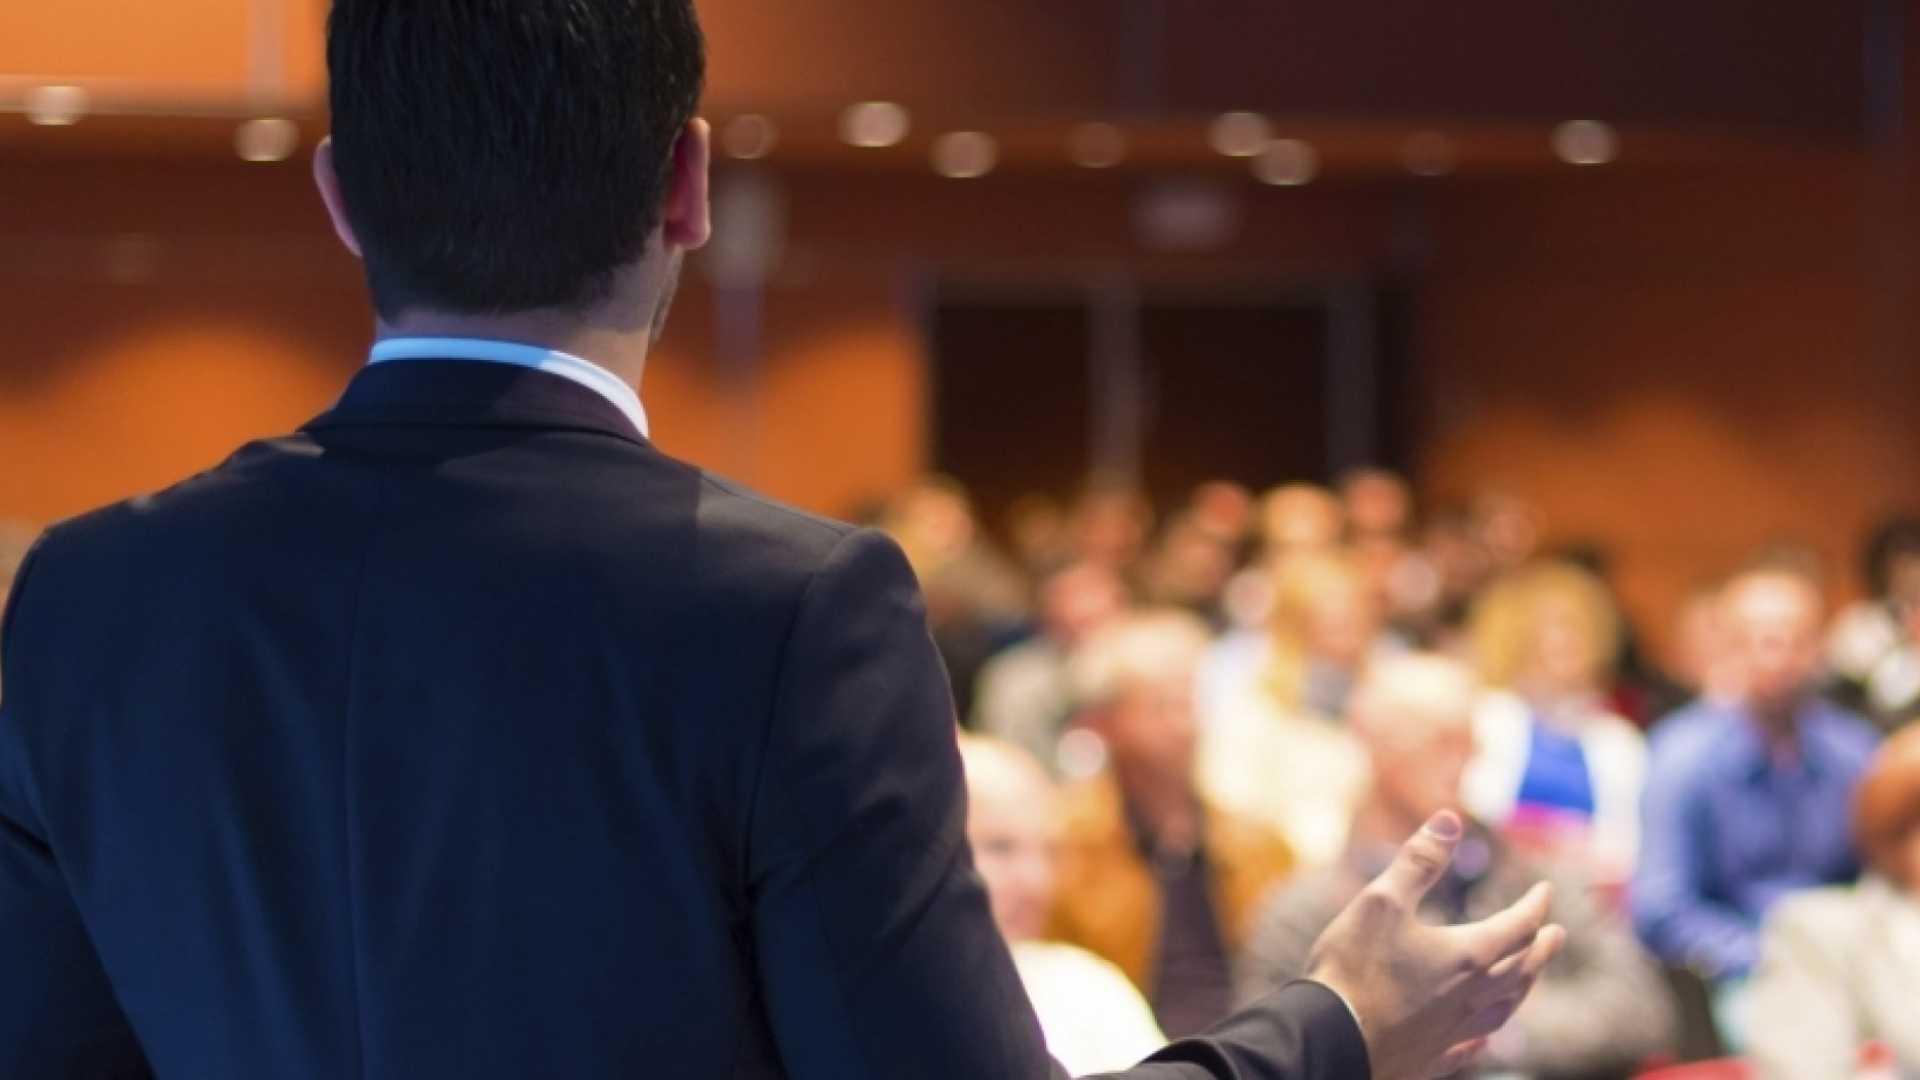 A Keynote Speaker's 13 Secrets For Mastering Professional Public Speaking